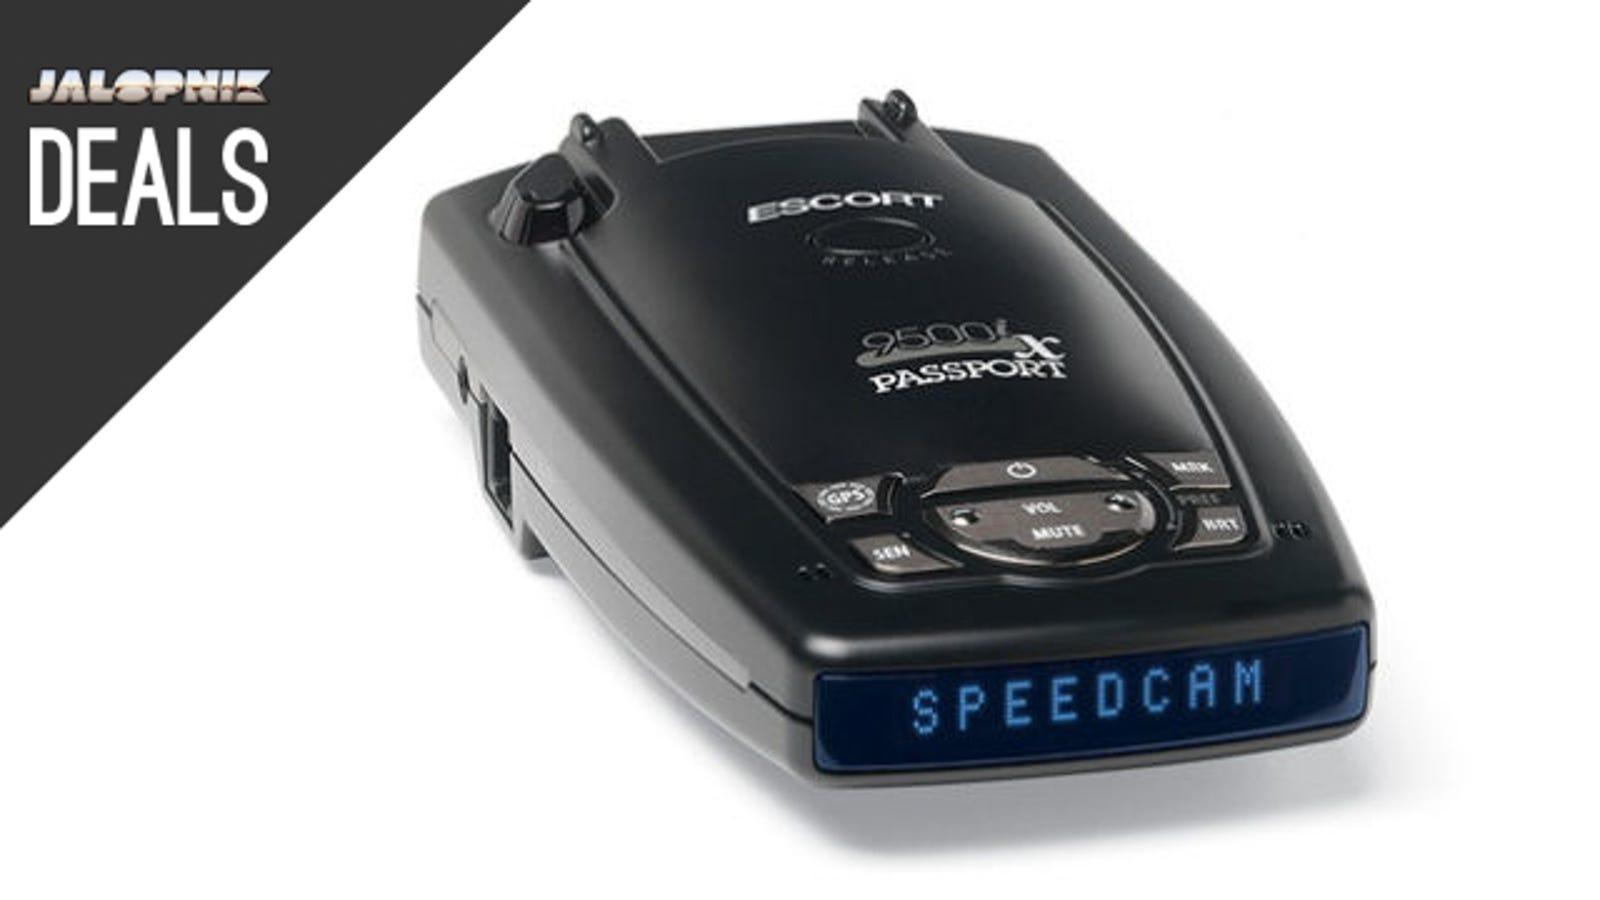 Escort Passport 9500Ix >> Deals: Escort Passport Radar Detector, Bike Rack, Entry Level Tool Set